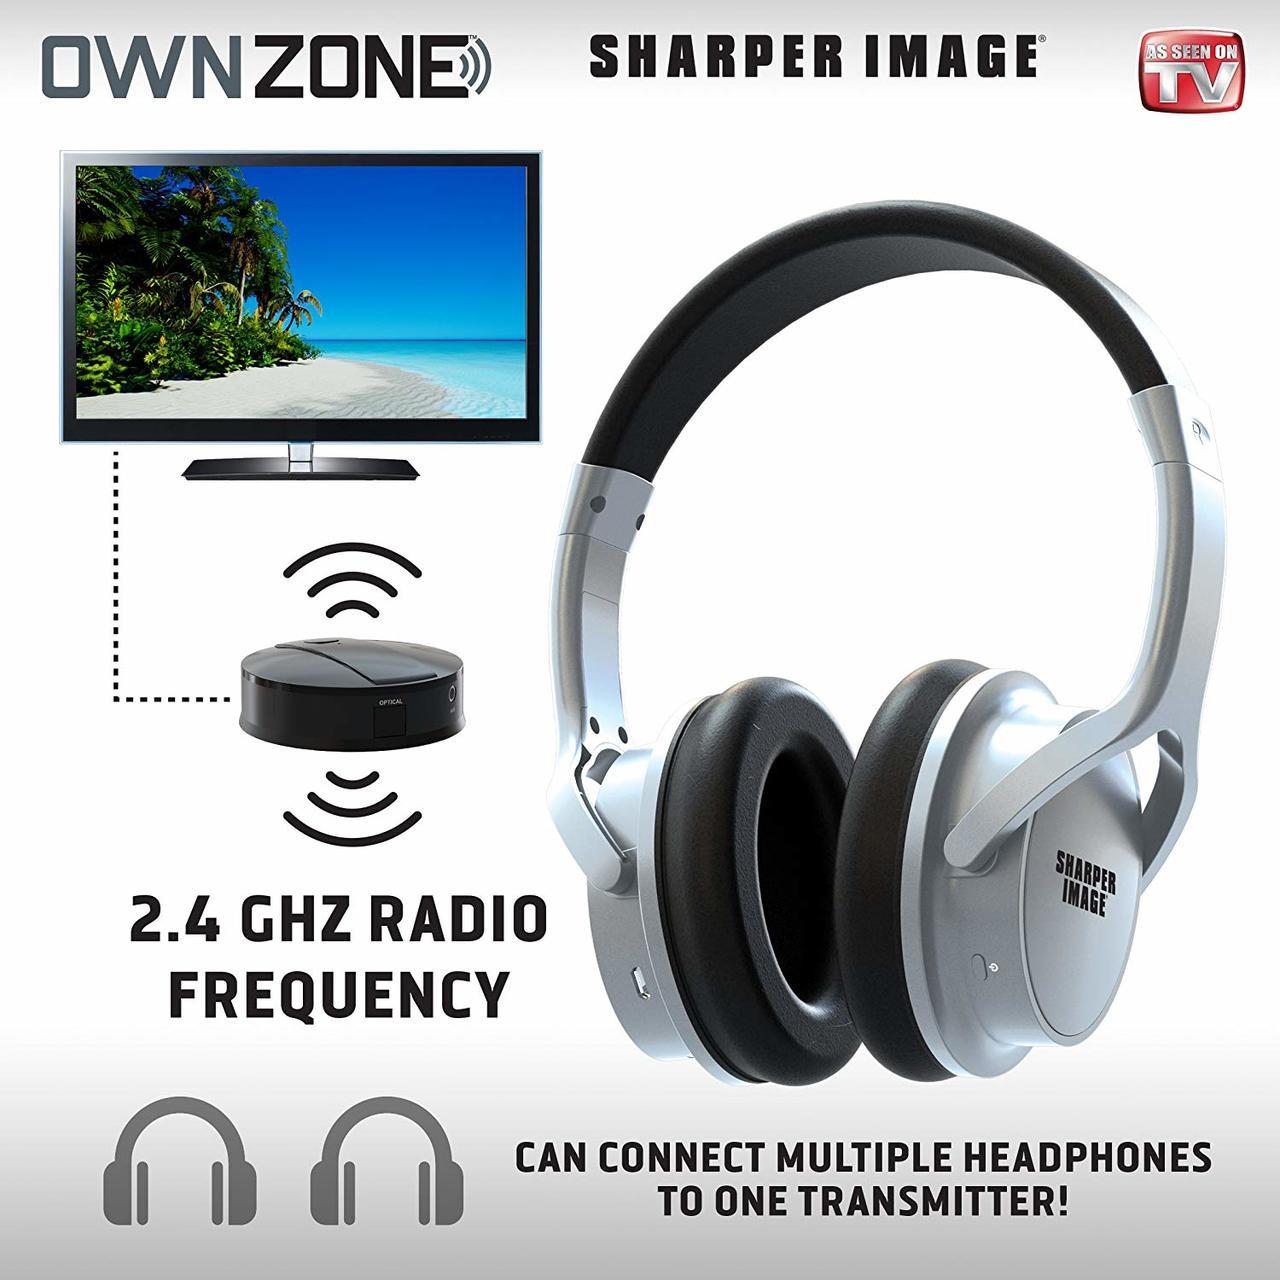 Sharper Image Own Zone Dlx Wireless Tv Headphones With Transmitter